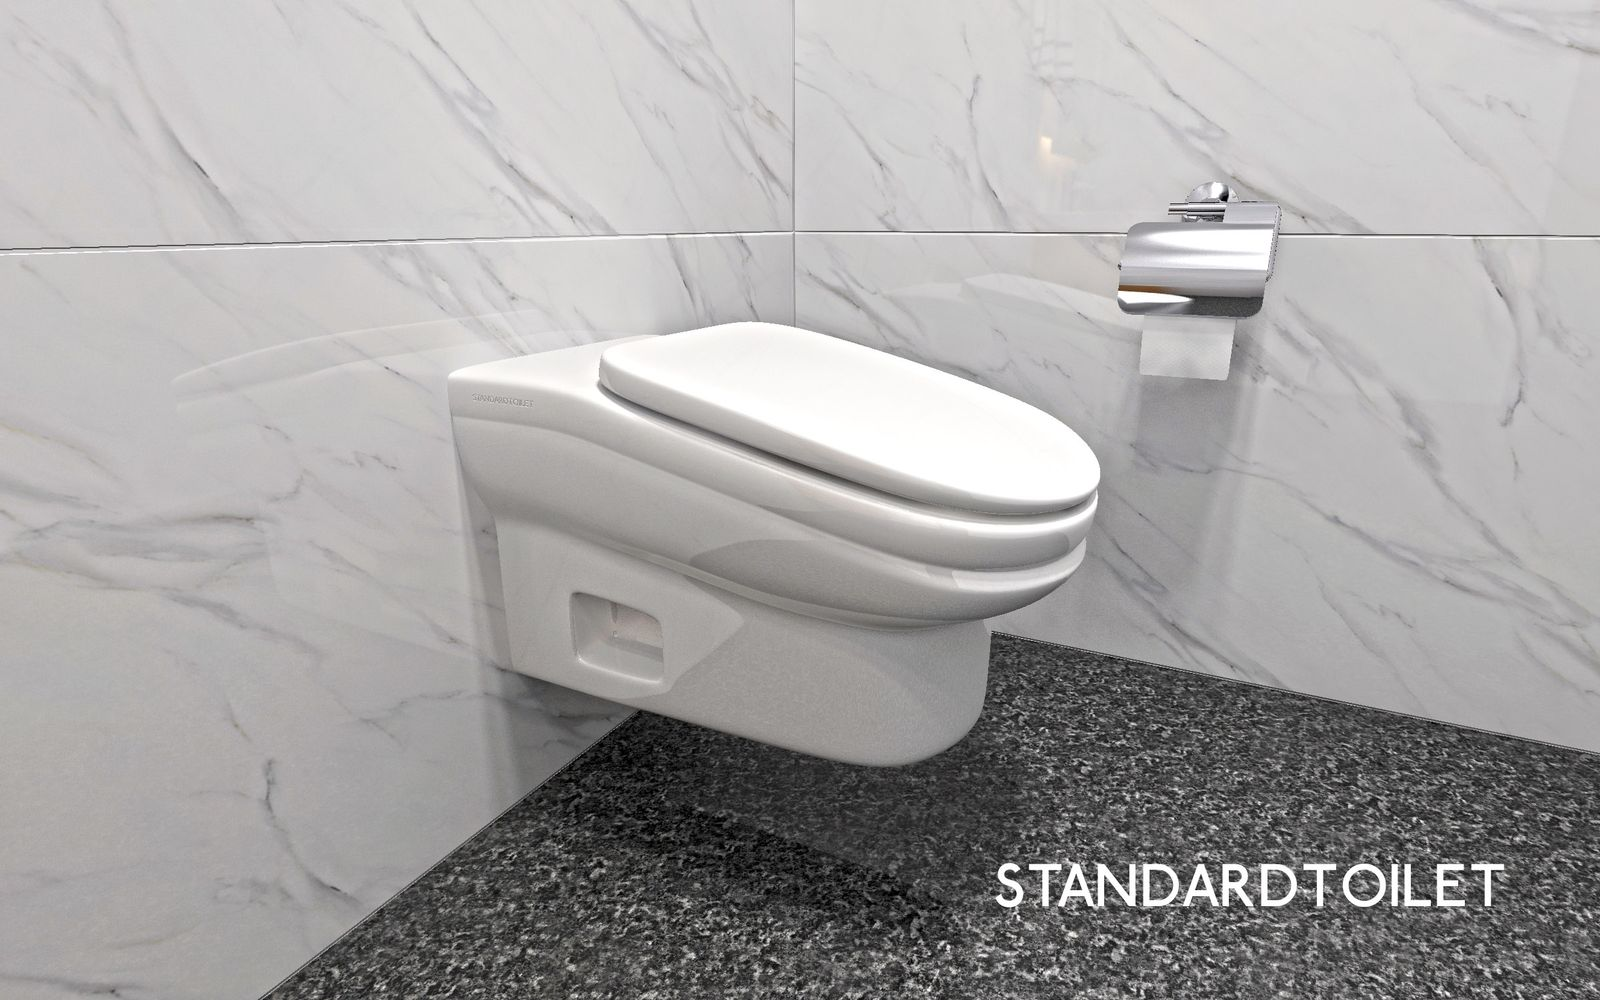 EINMALIGE VERWENDUNG Standard Toilet / standardtoilet.net